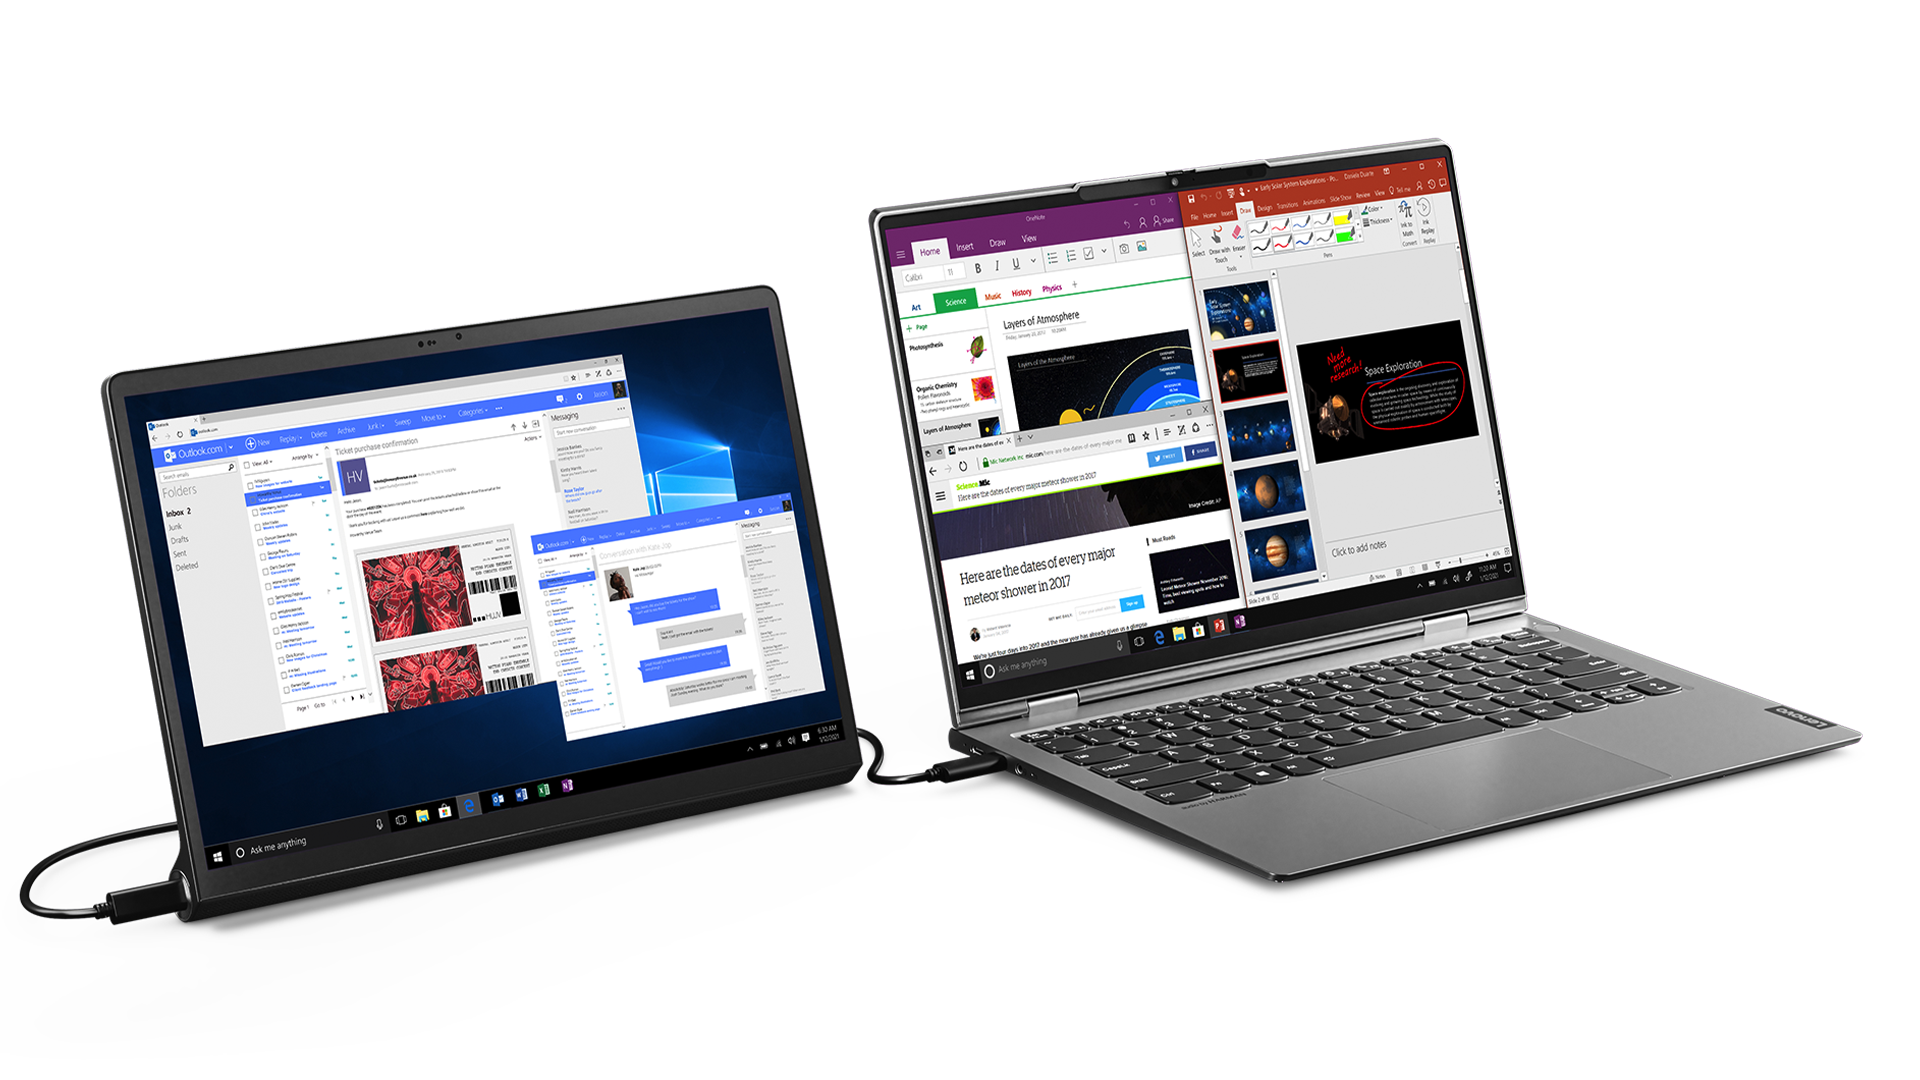 The Lenovo Yoga Tab 13